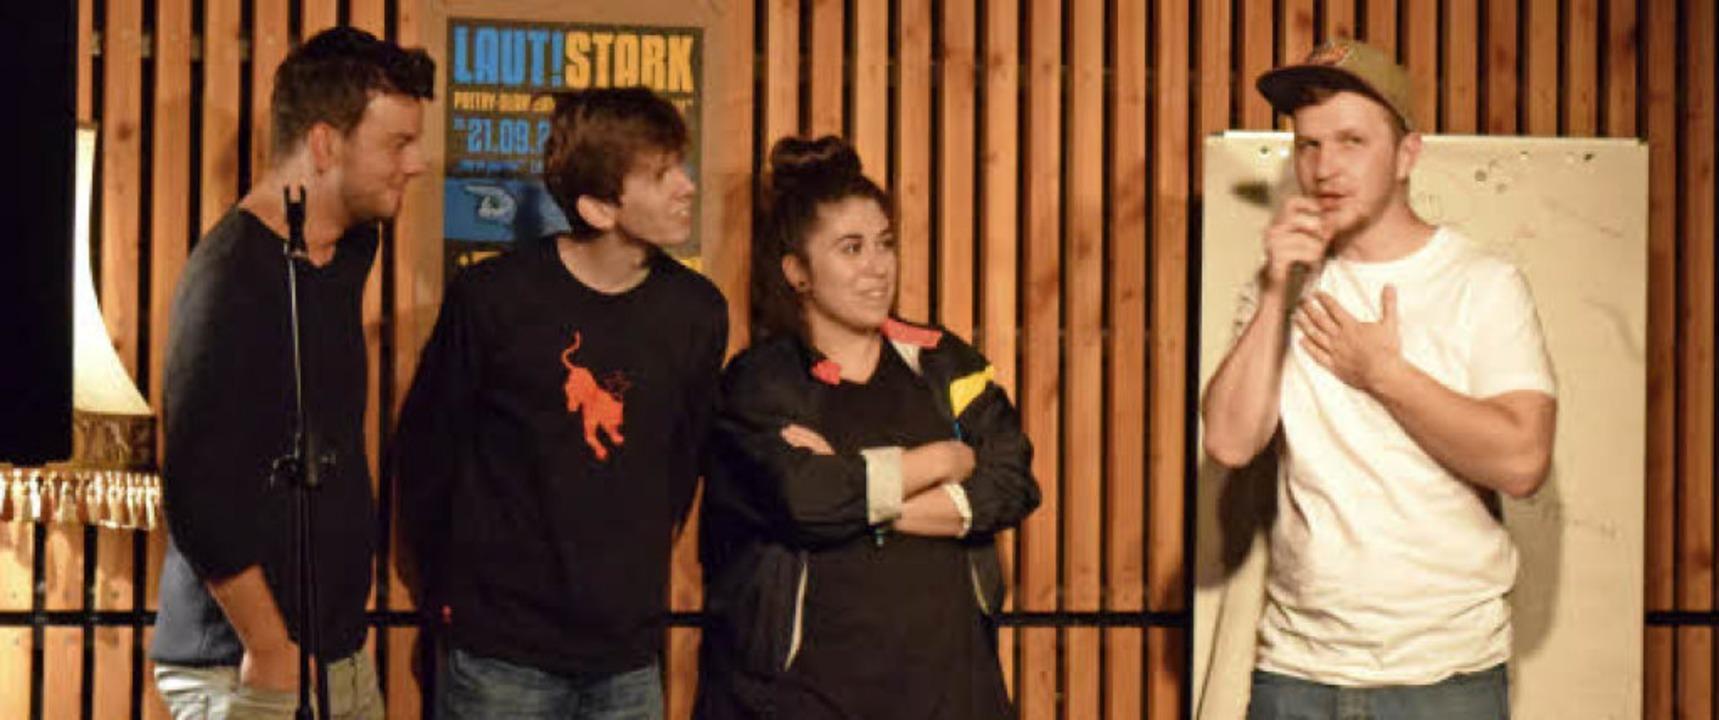 Die Slam-Finalisten Marius Loy, Noah K... (v.l.) mit Moderator Nik Salsflausen   | Foto: Sandra Raith